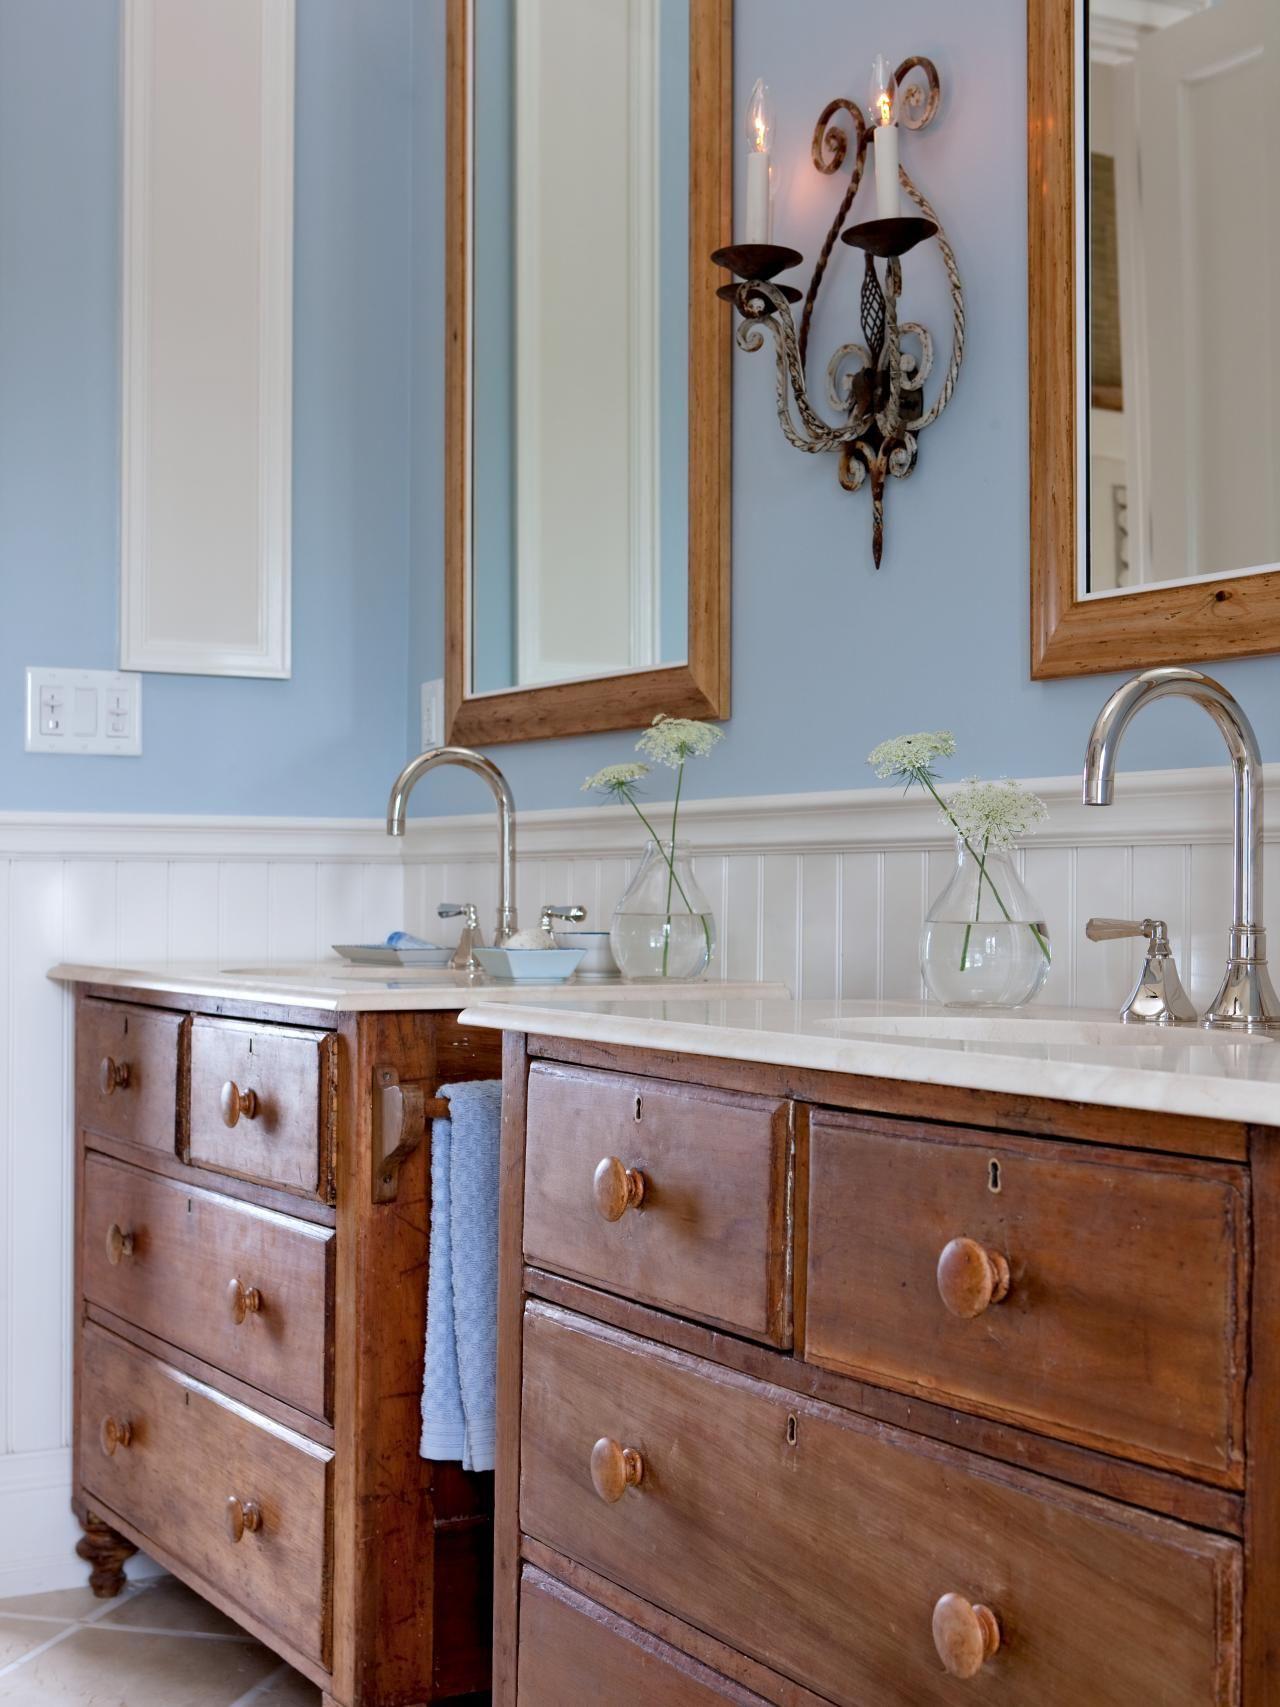 Dreamy Bathroom Vanities and Countertops Vintage Dressers Sarah